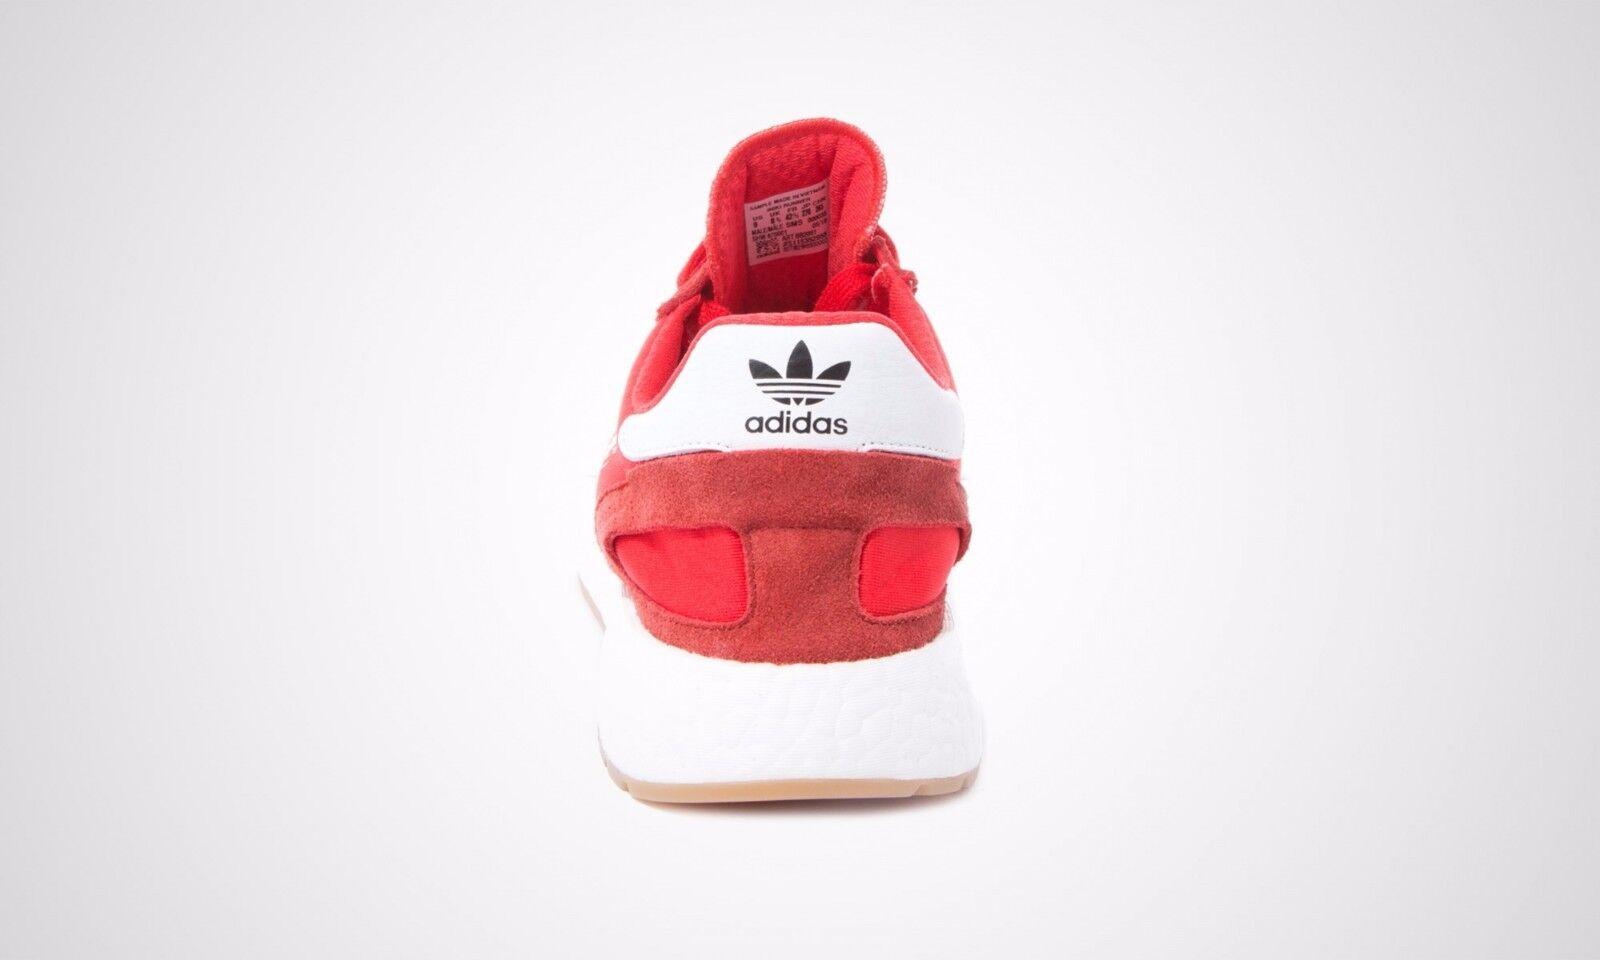 Adidas Adidas Adidas iniki läufer größe 12,5.rot - weiß - kaugummi.bb2091.das nationale überwachungsdirektorat ultra - impuls - pk bb8104